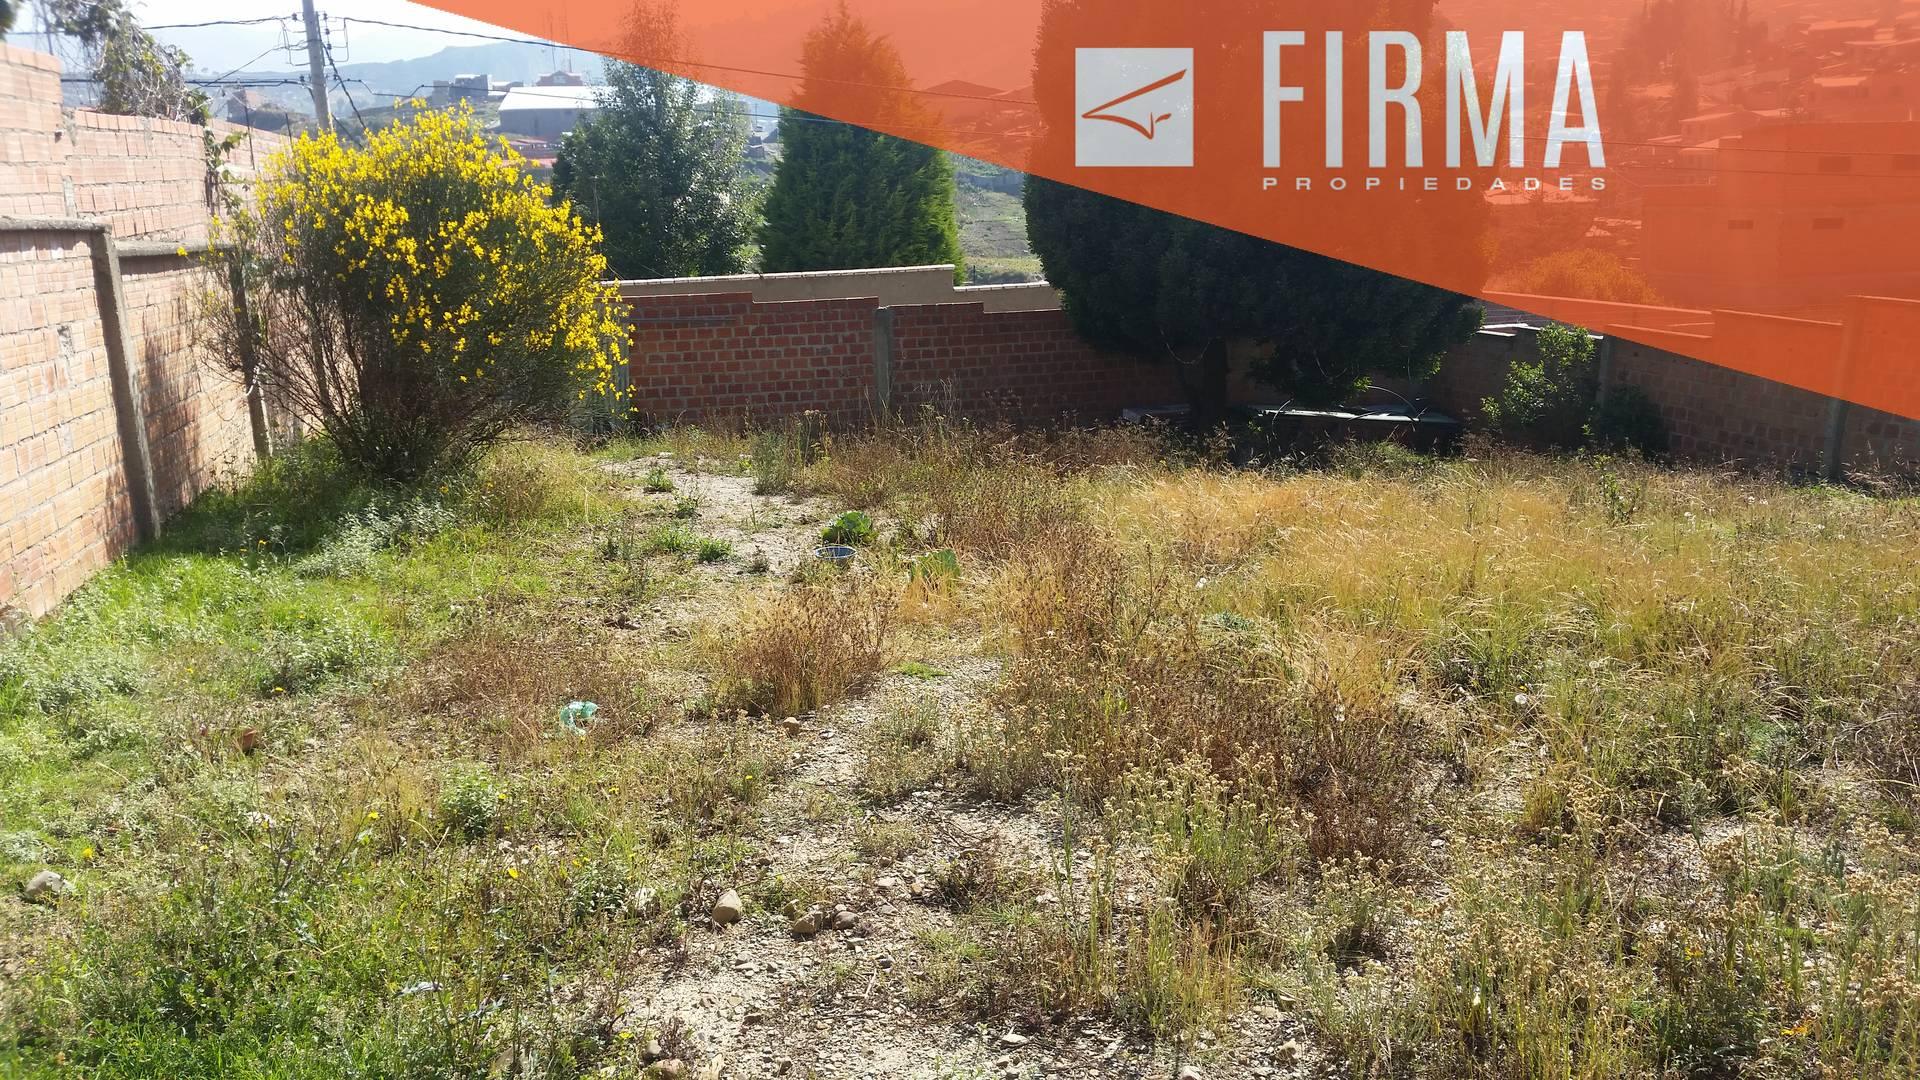 Terreno en Venta FTV34954 – COMPRA ESTE TERRENO EN CODAVISA Foto 3